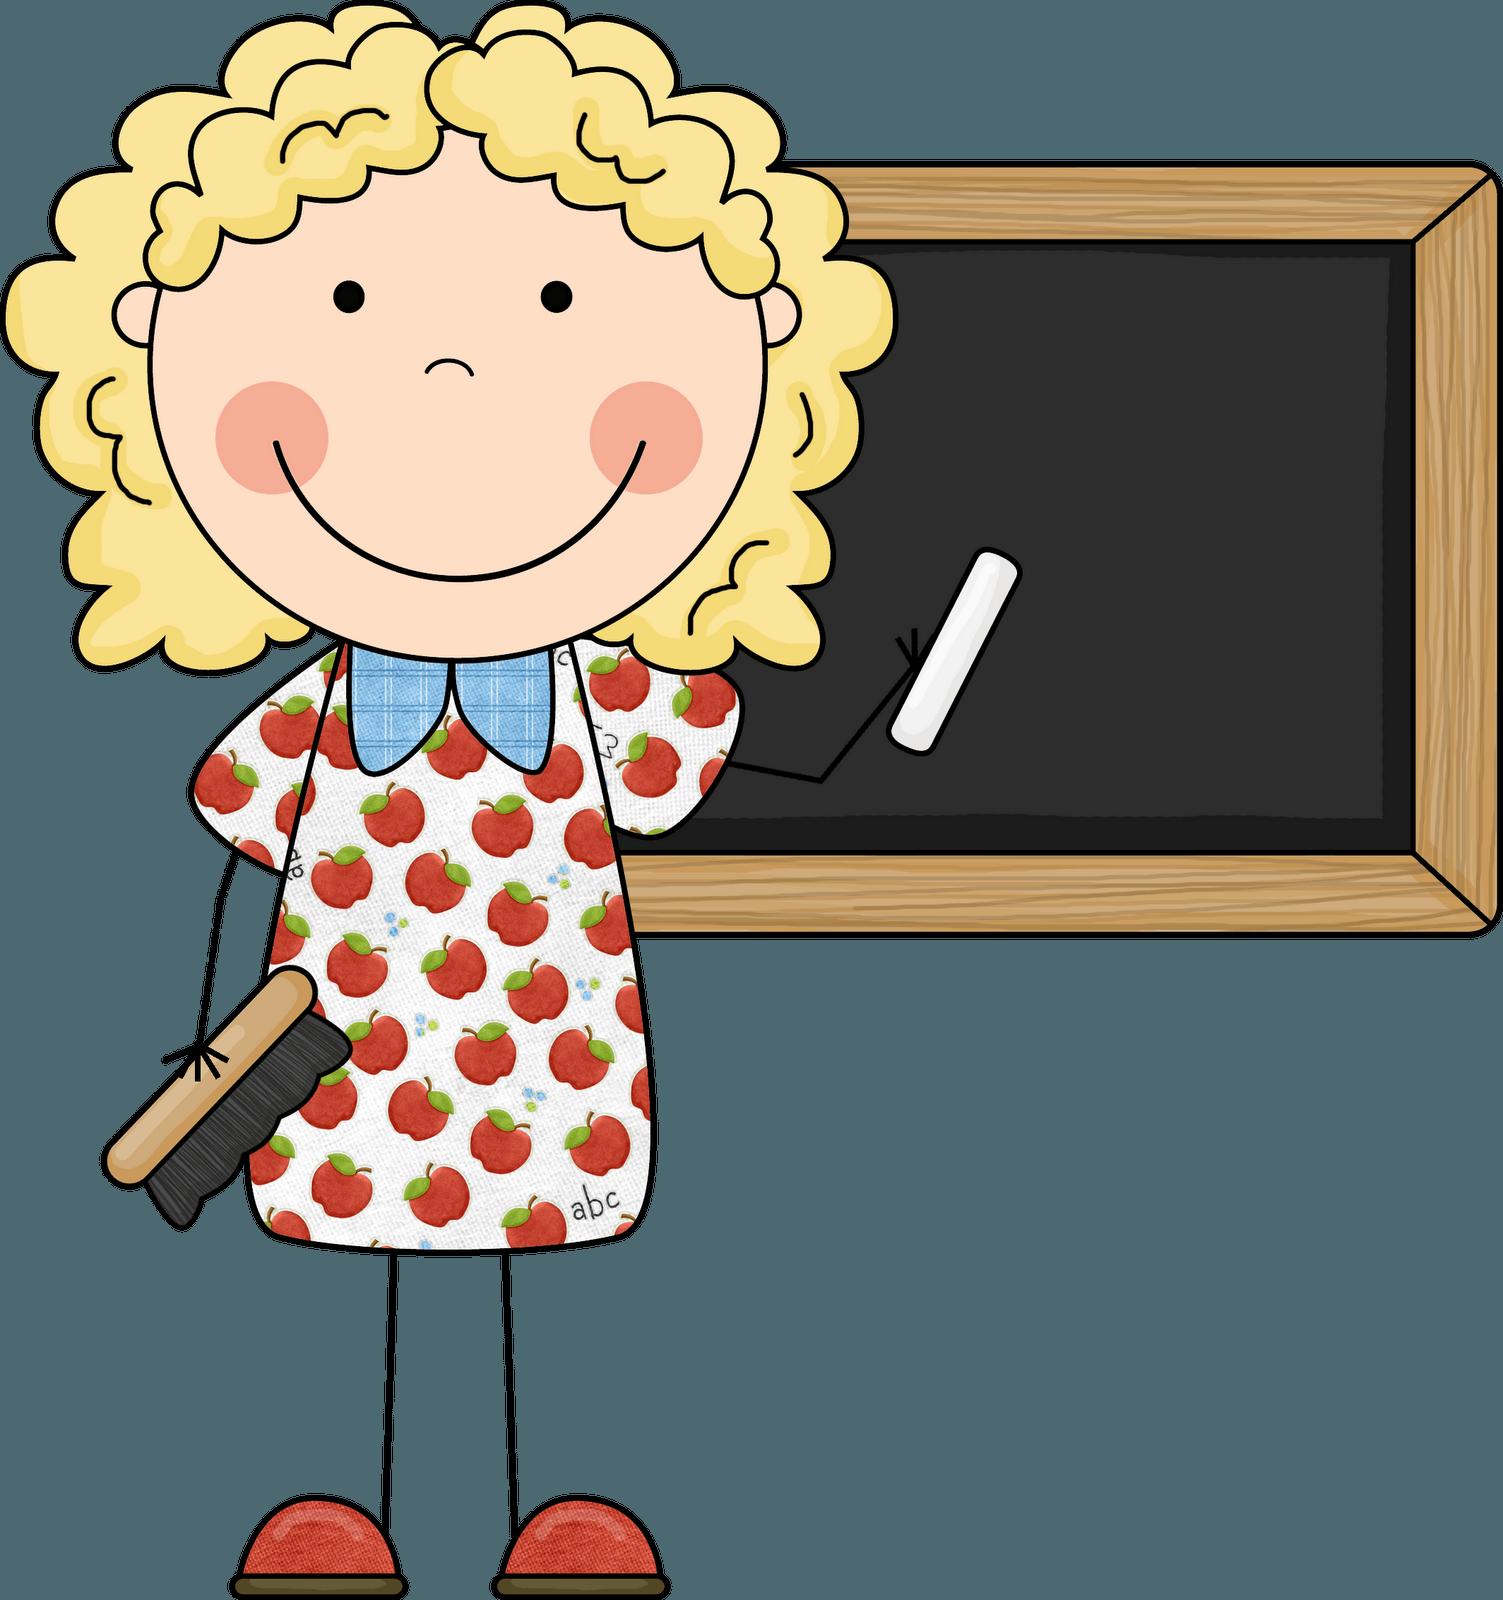 Clip art teachers graphic royalty free good teacher clipart - Google Search | KIDS CLIPART | Pinterest ... graphic royalty free